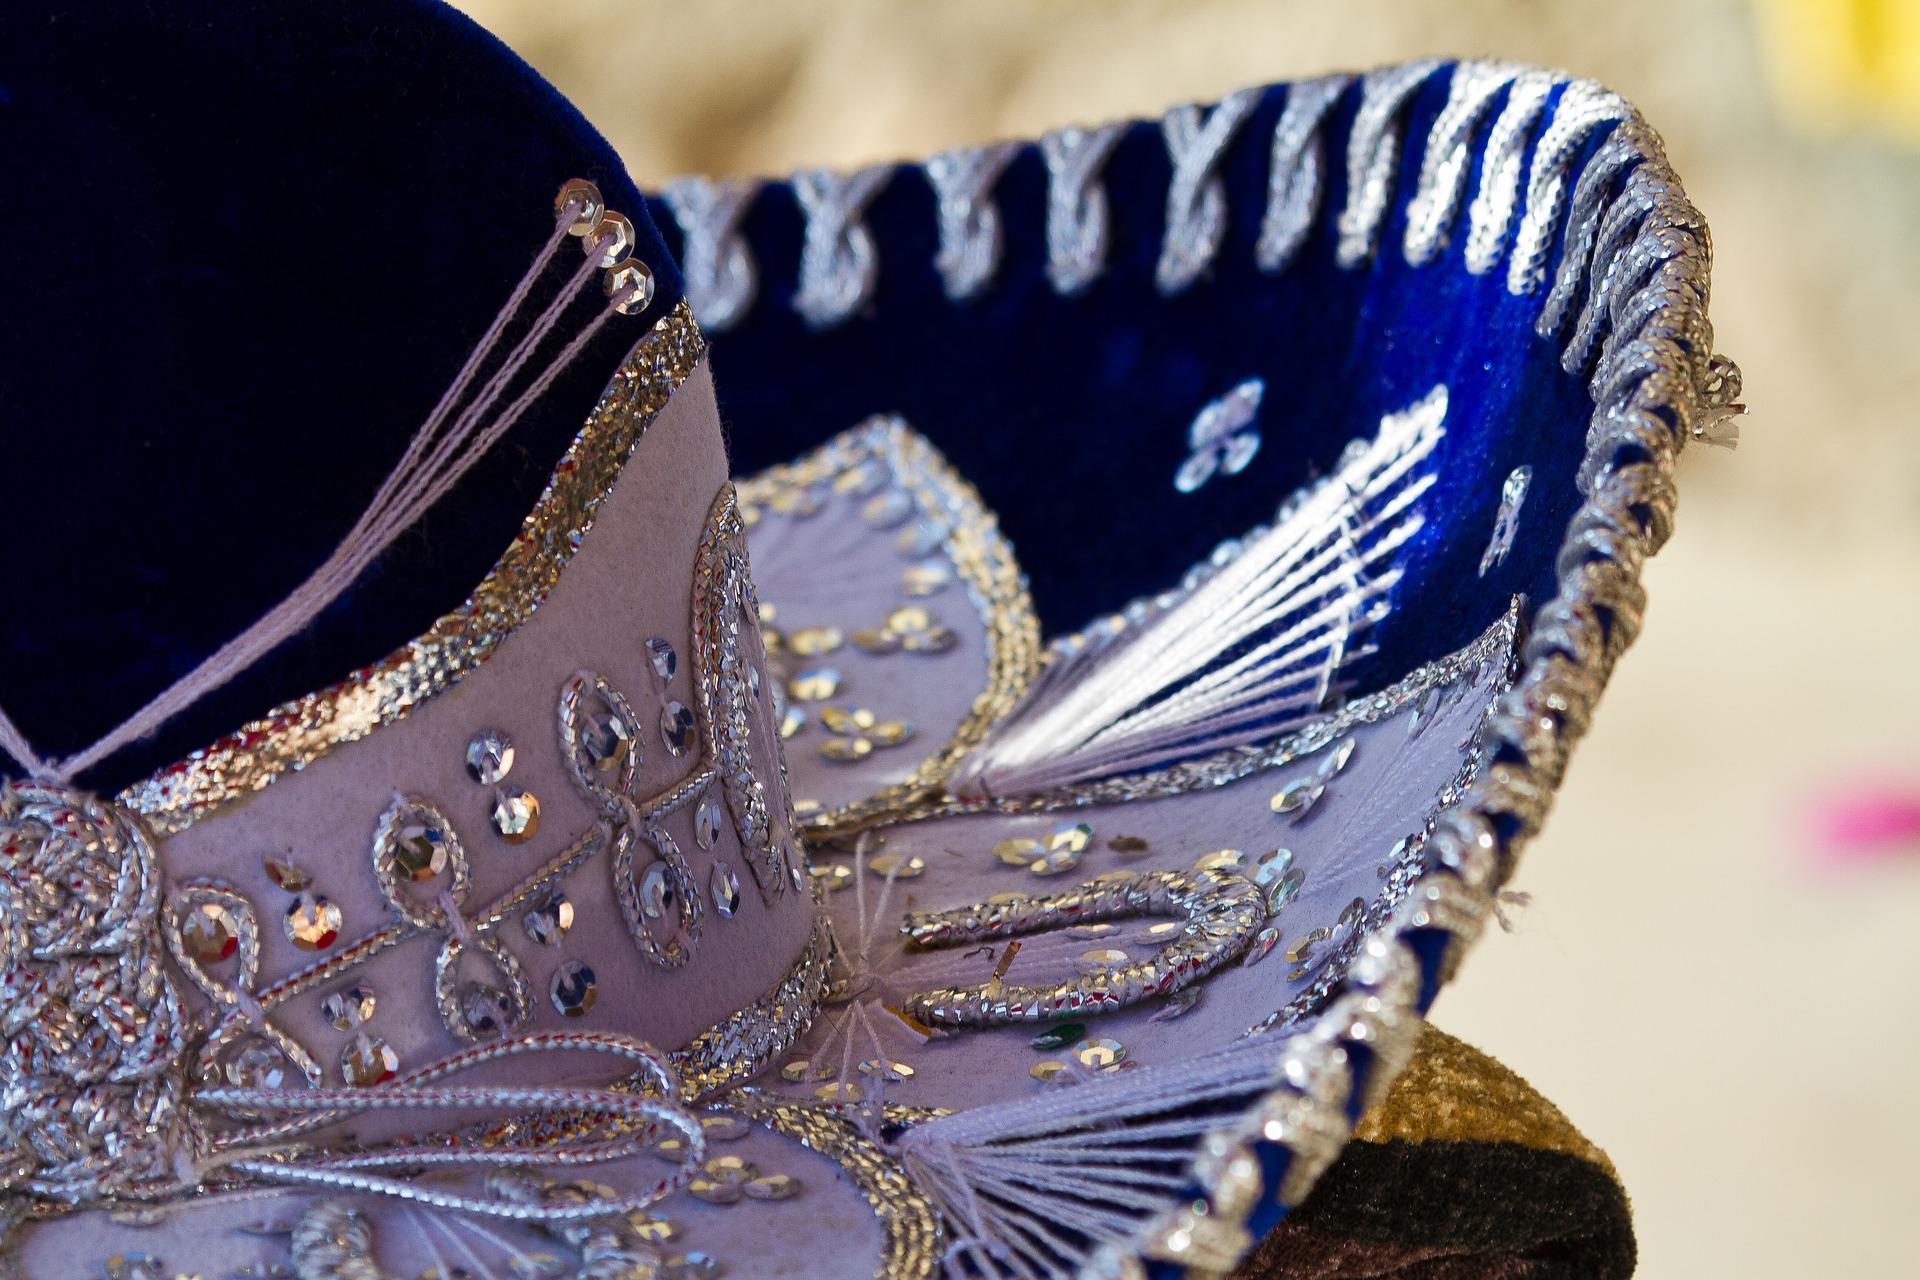 Sombrero Mariachi para viajar a Mexico